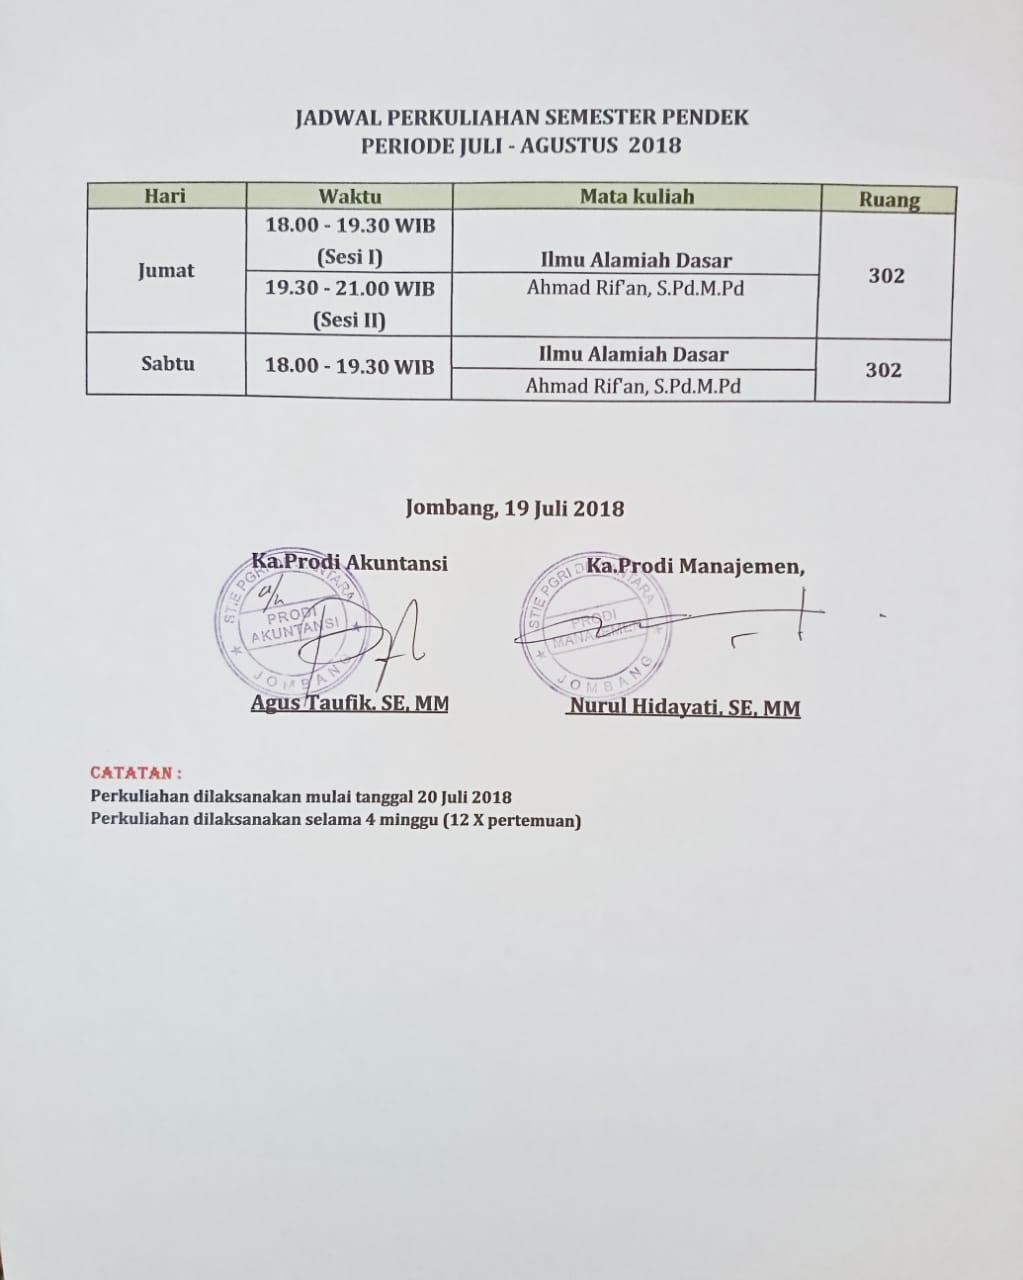 JADWAL PERKULIAHAN SEMESTER PENDEK PERIODE JULI-AGUSTUS 2018